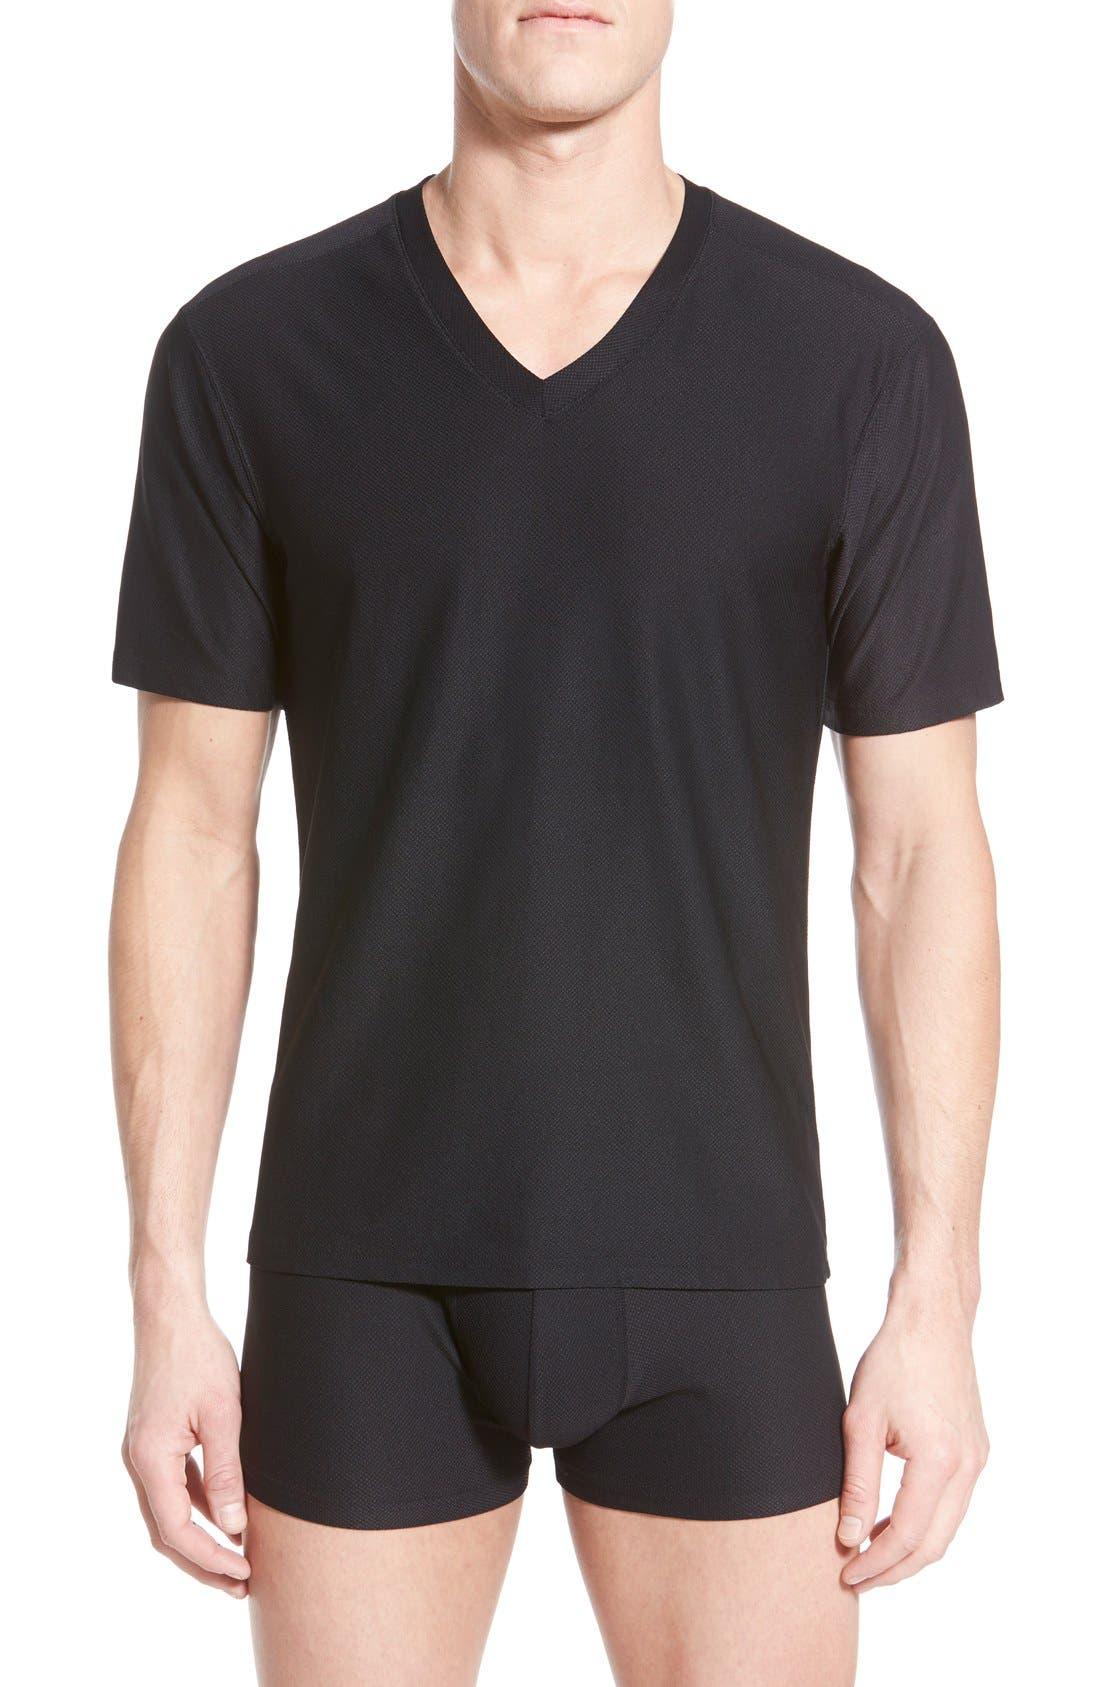 'Give-N-Go' Mesh V-Neck T-Shirt,                             Main thumbnail 1, color,                             BLACK